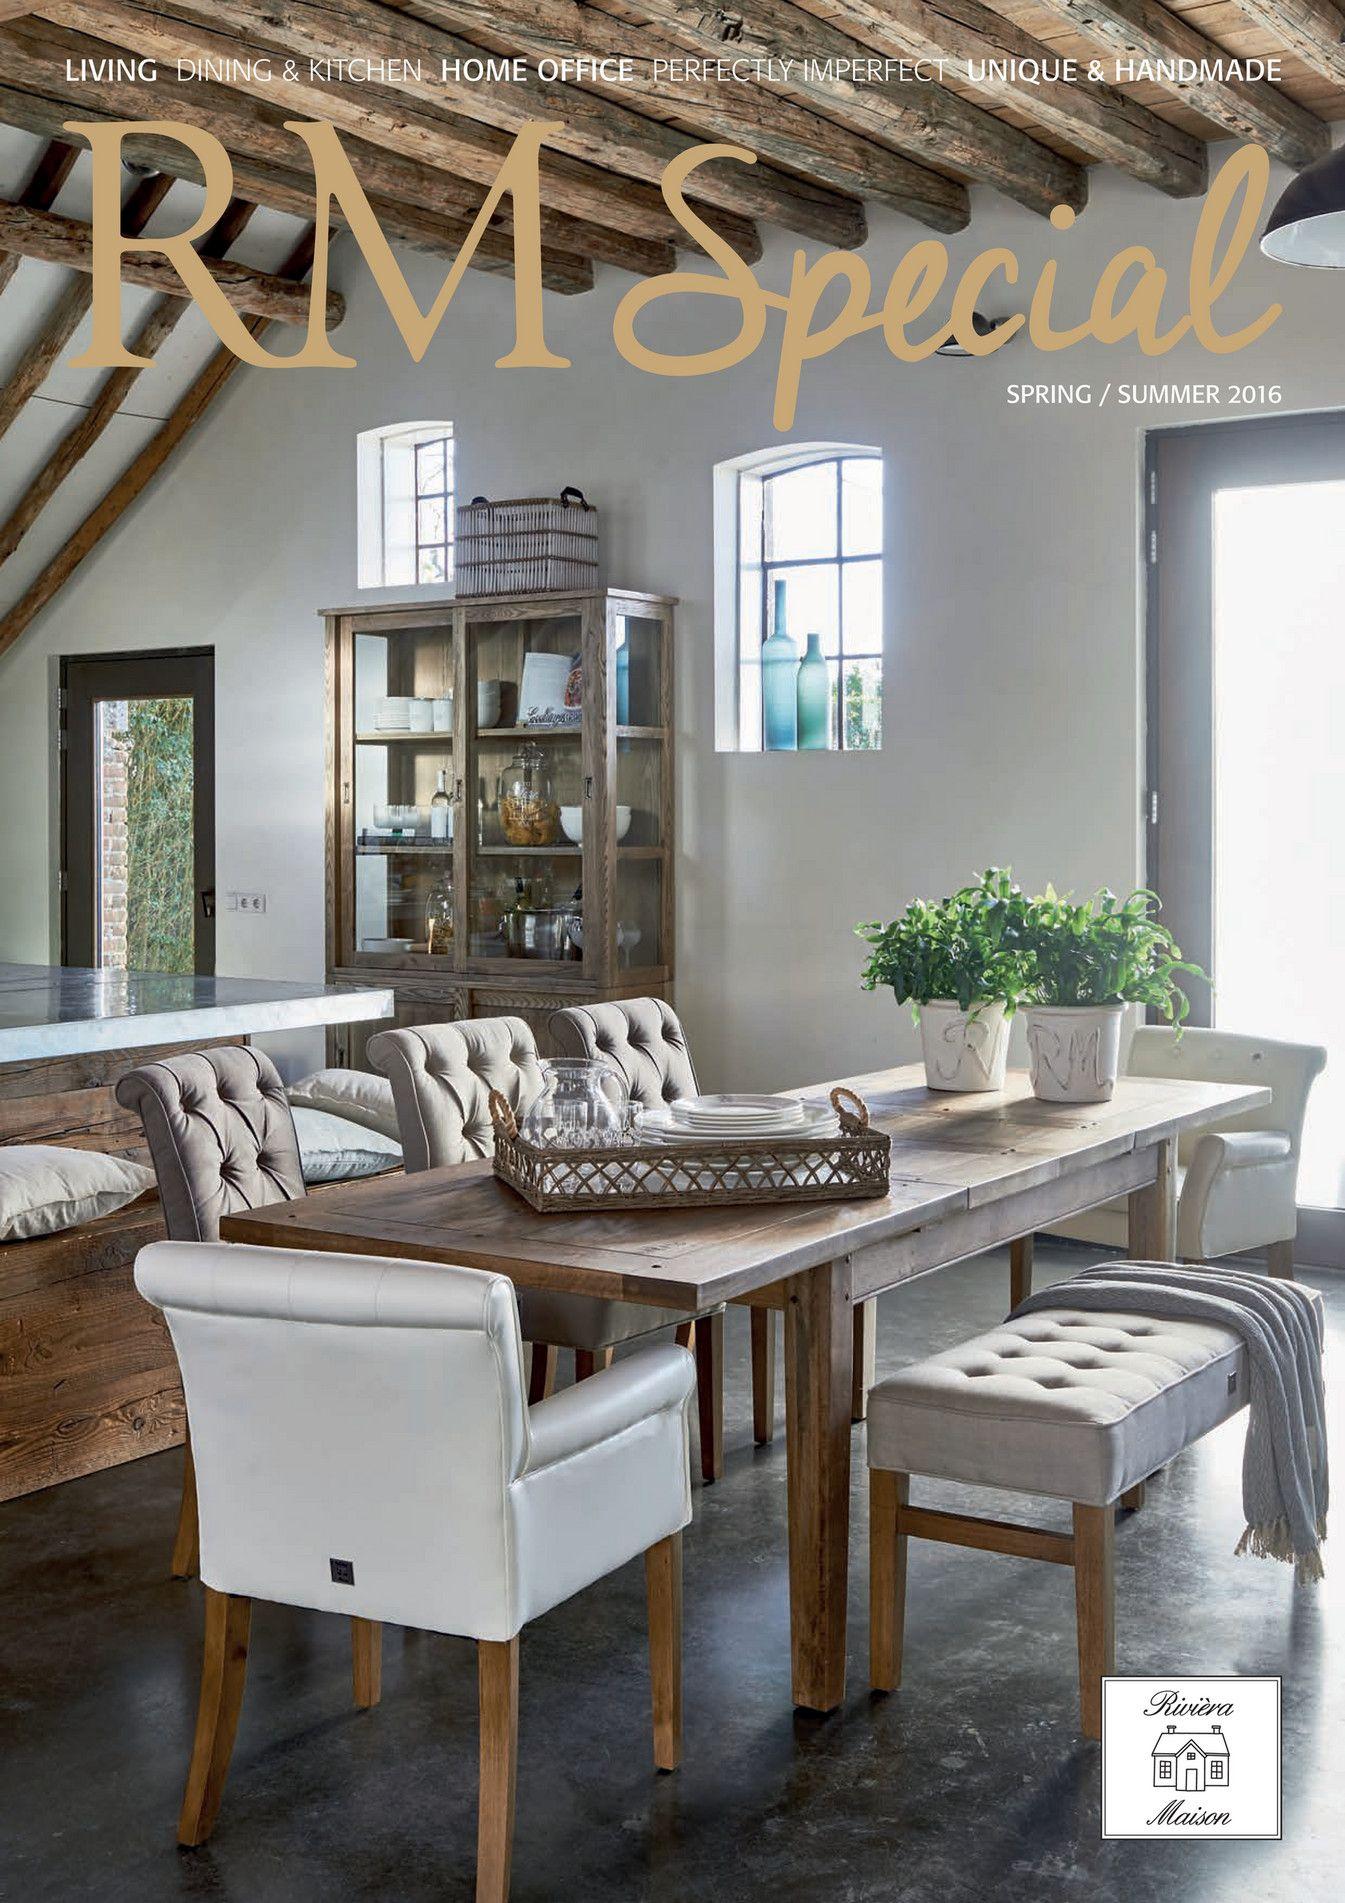 Riviera Maison Eetkamerbank.Rm Magazine Special Spring Summer 2016 Nl Riviera Maison My Way